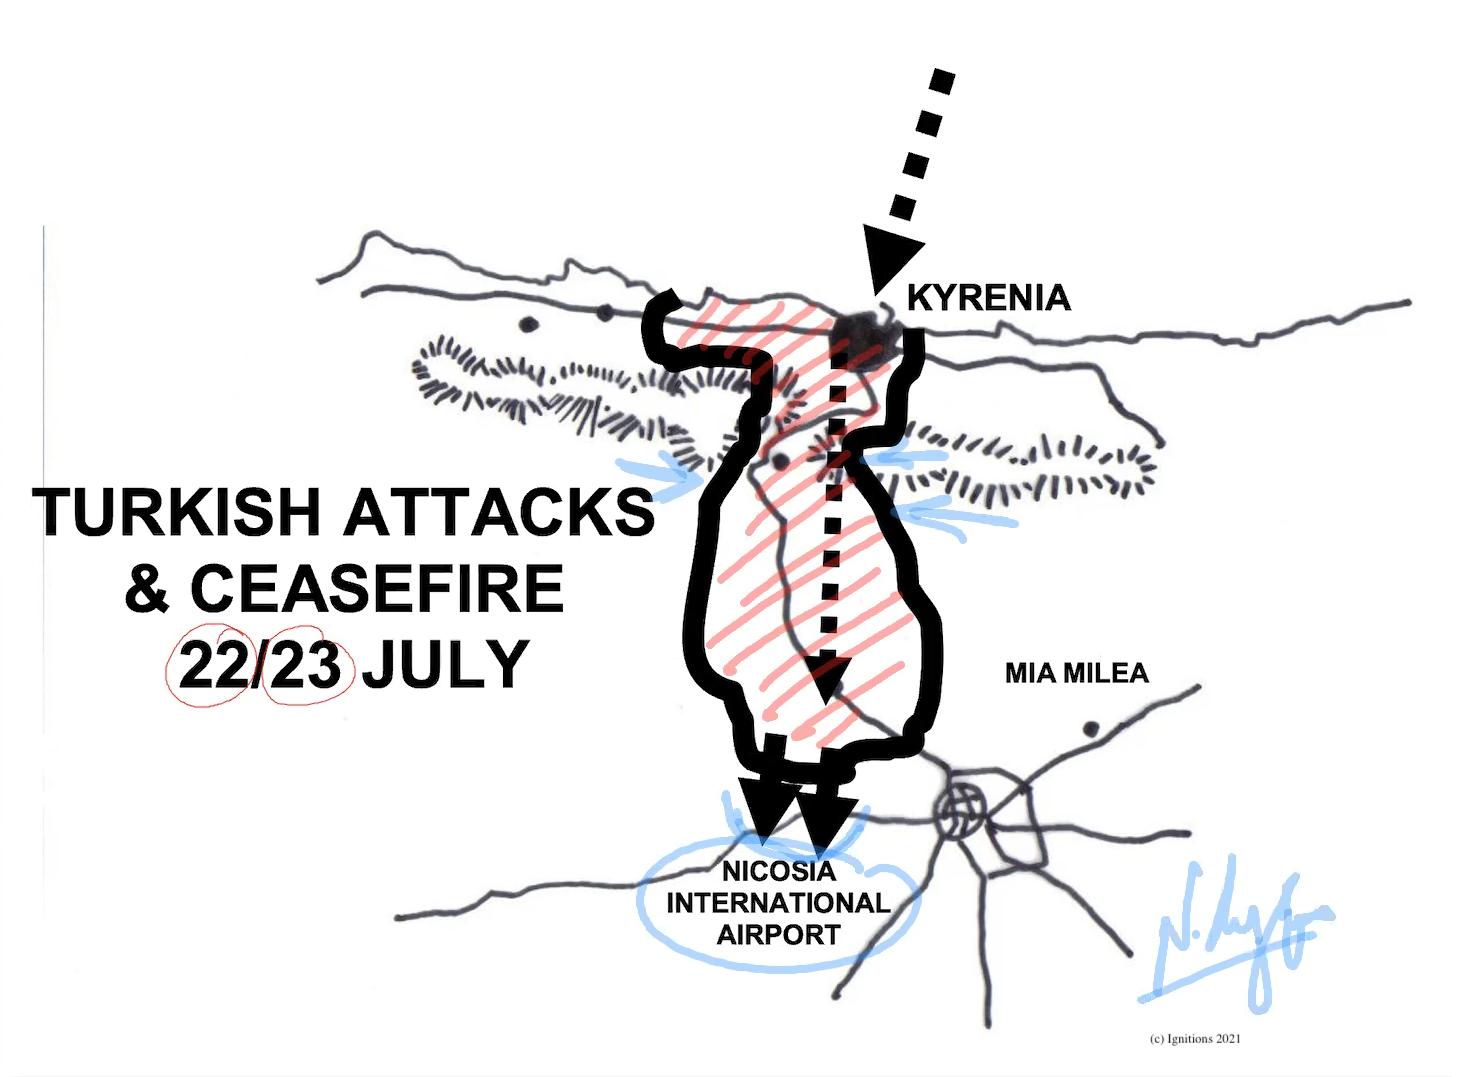 63519 - e-Masterclass VII: Η Μάχη της Κύπρου. Covid Free. (Dessin)